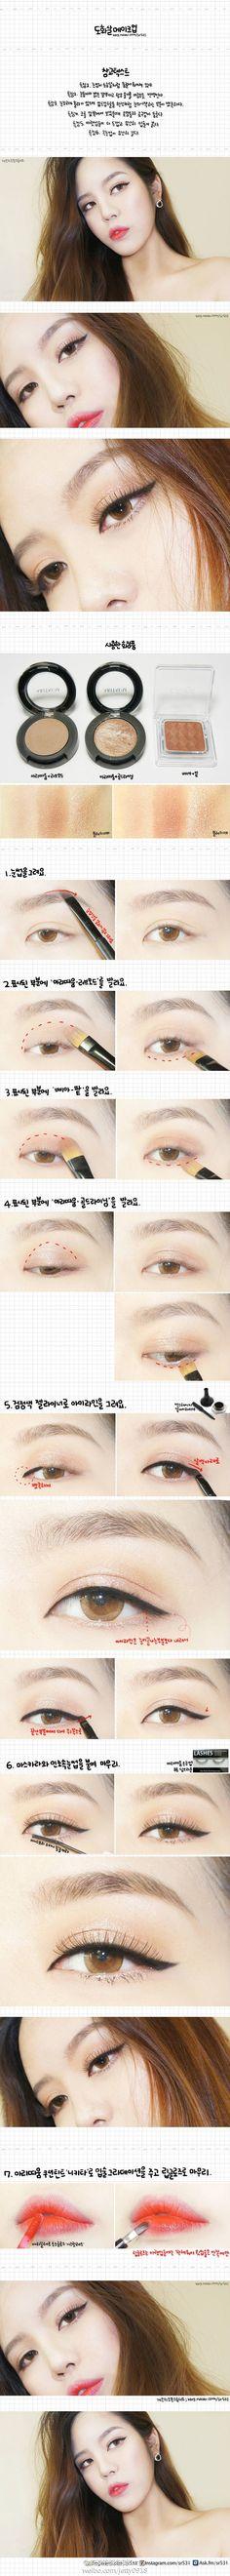 korea make up